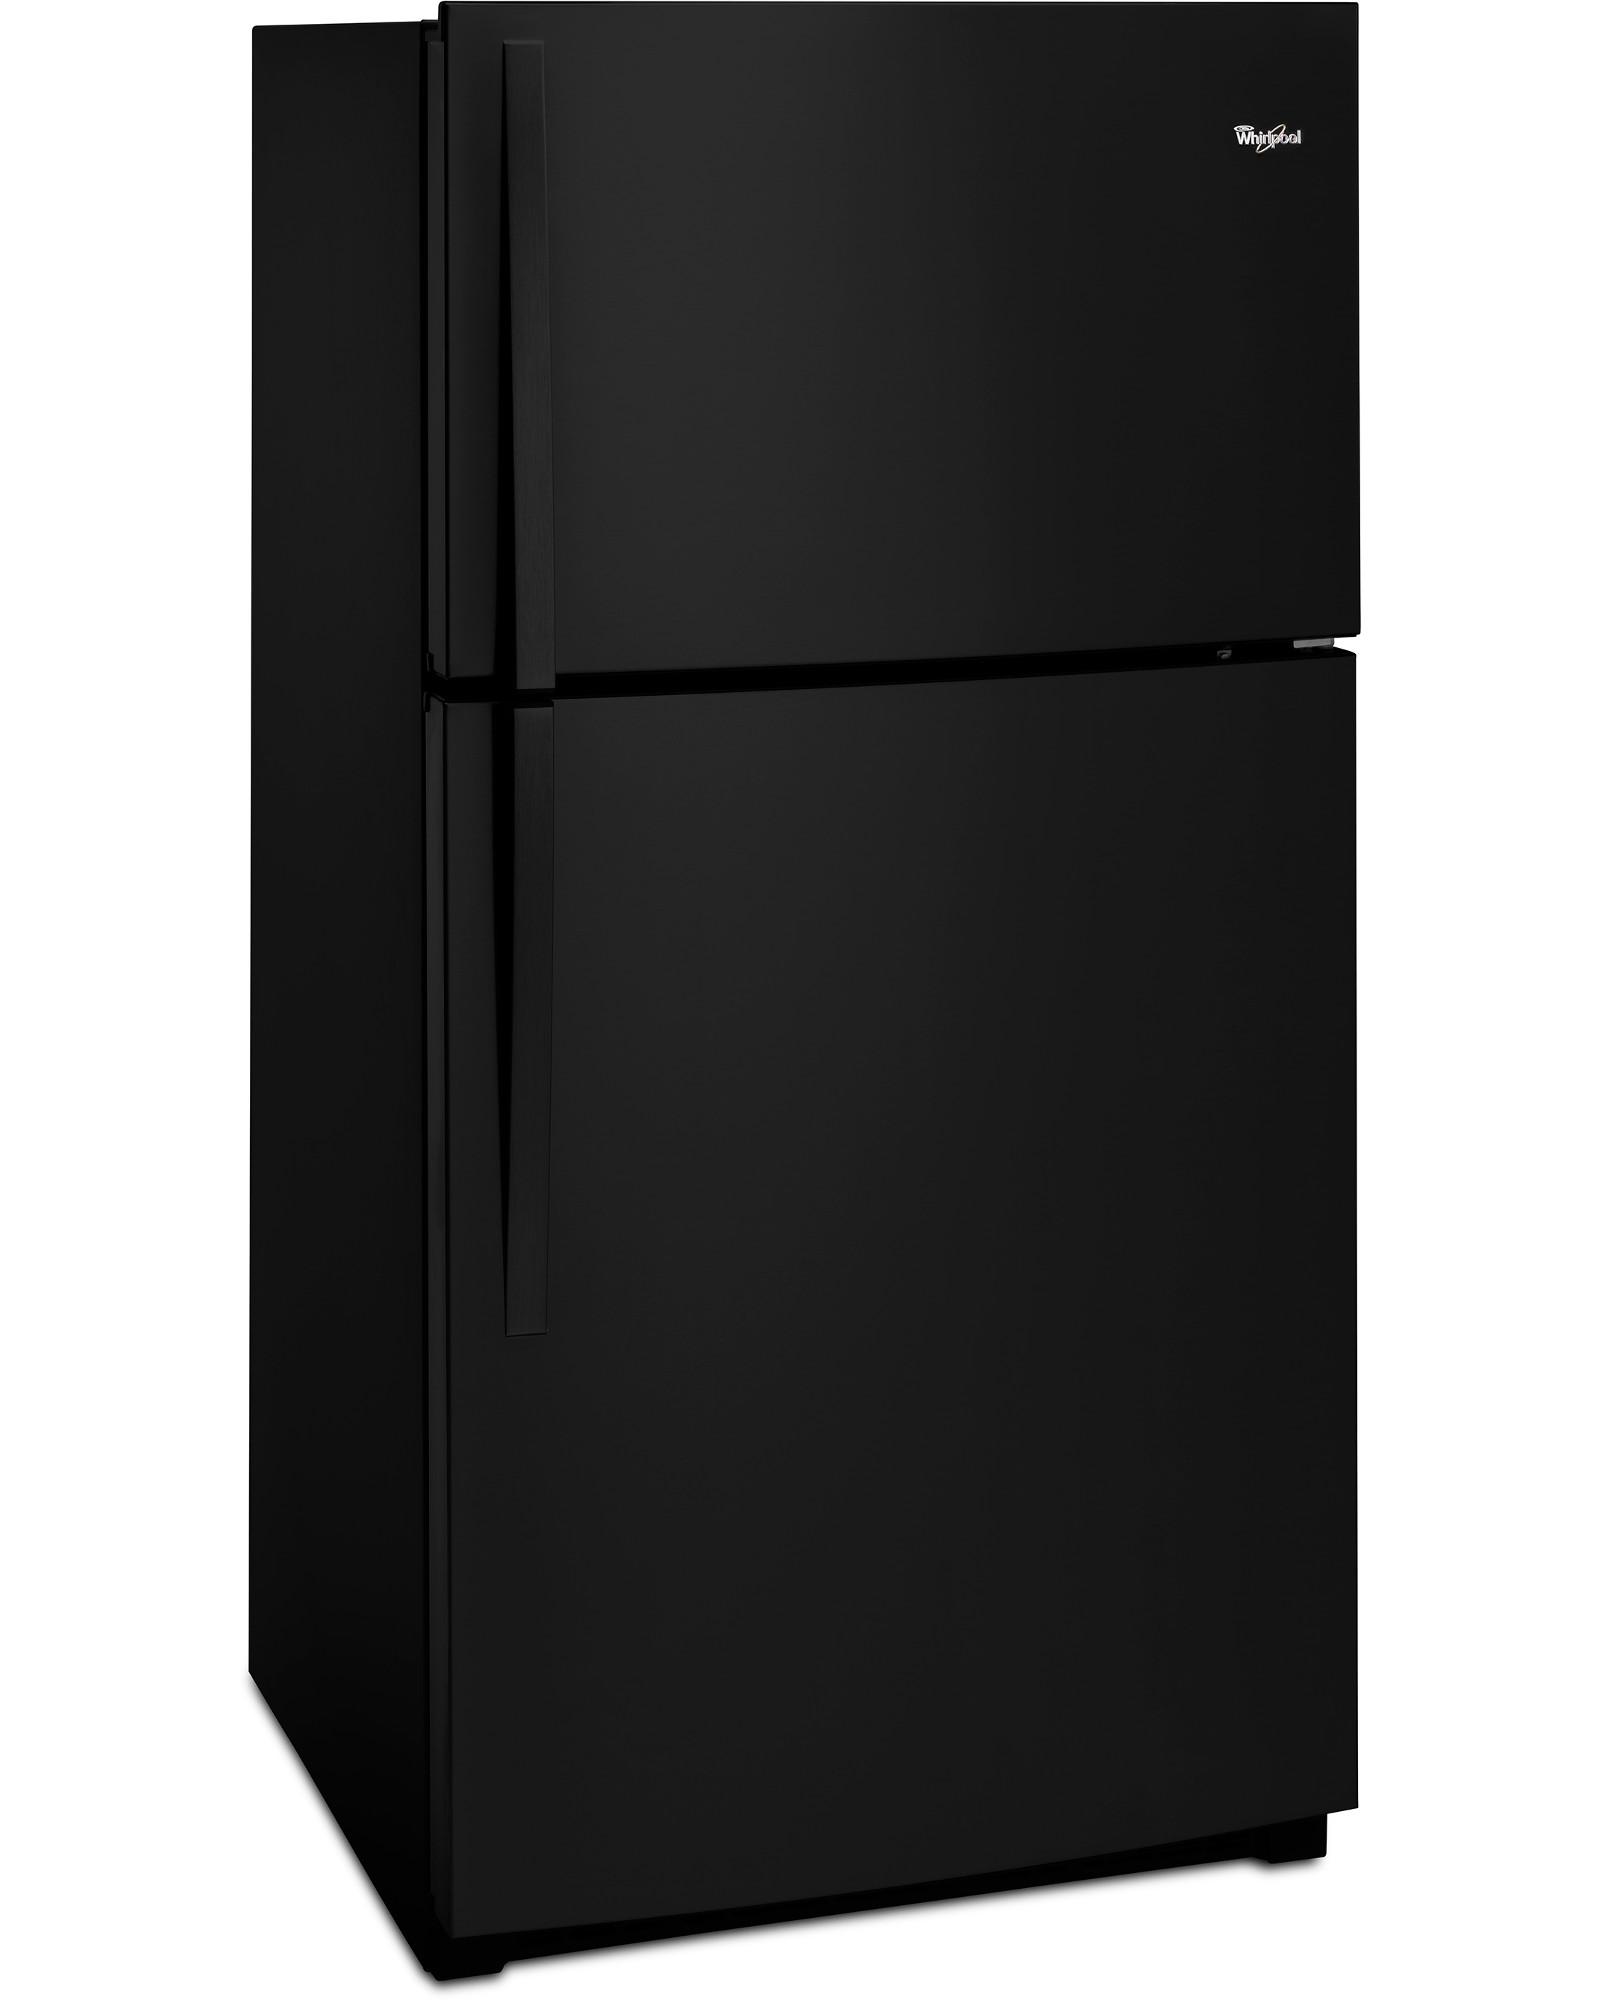 Whirlpool WRT511SZDB 21 cu. ft. Top Freezer Refrigerator w/ LED Interior Lighting - Black